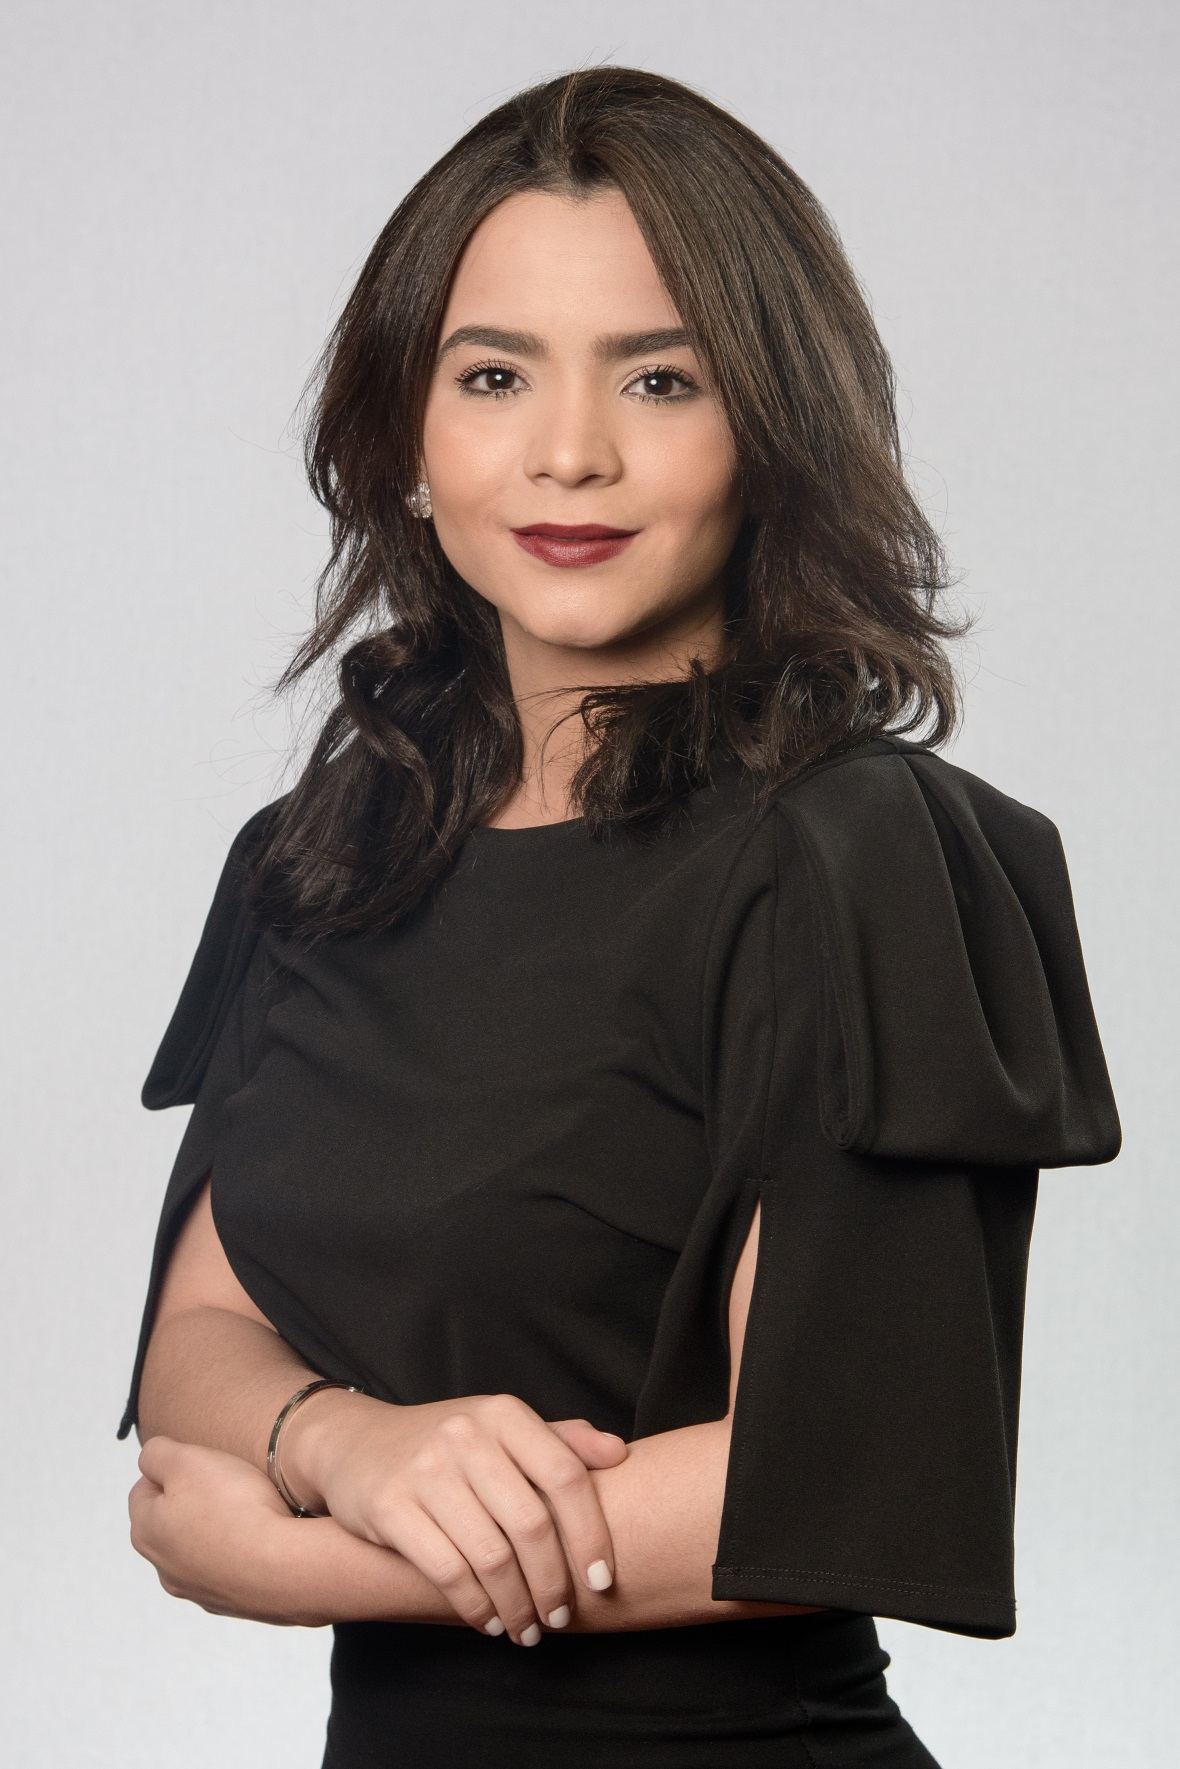 Lia Mariotti Paz